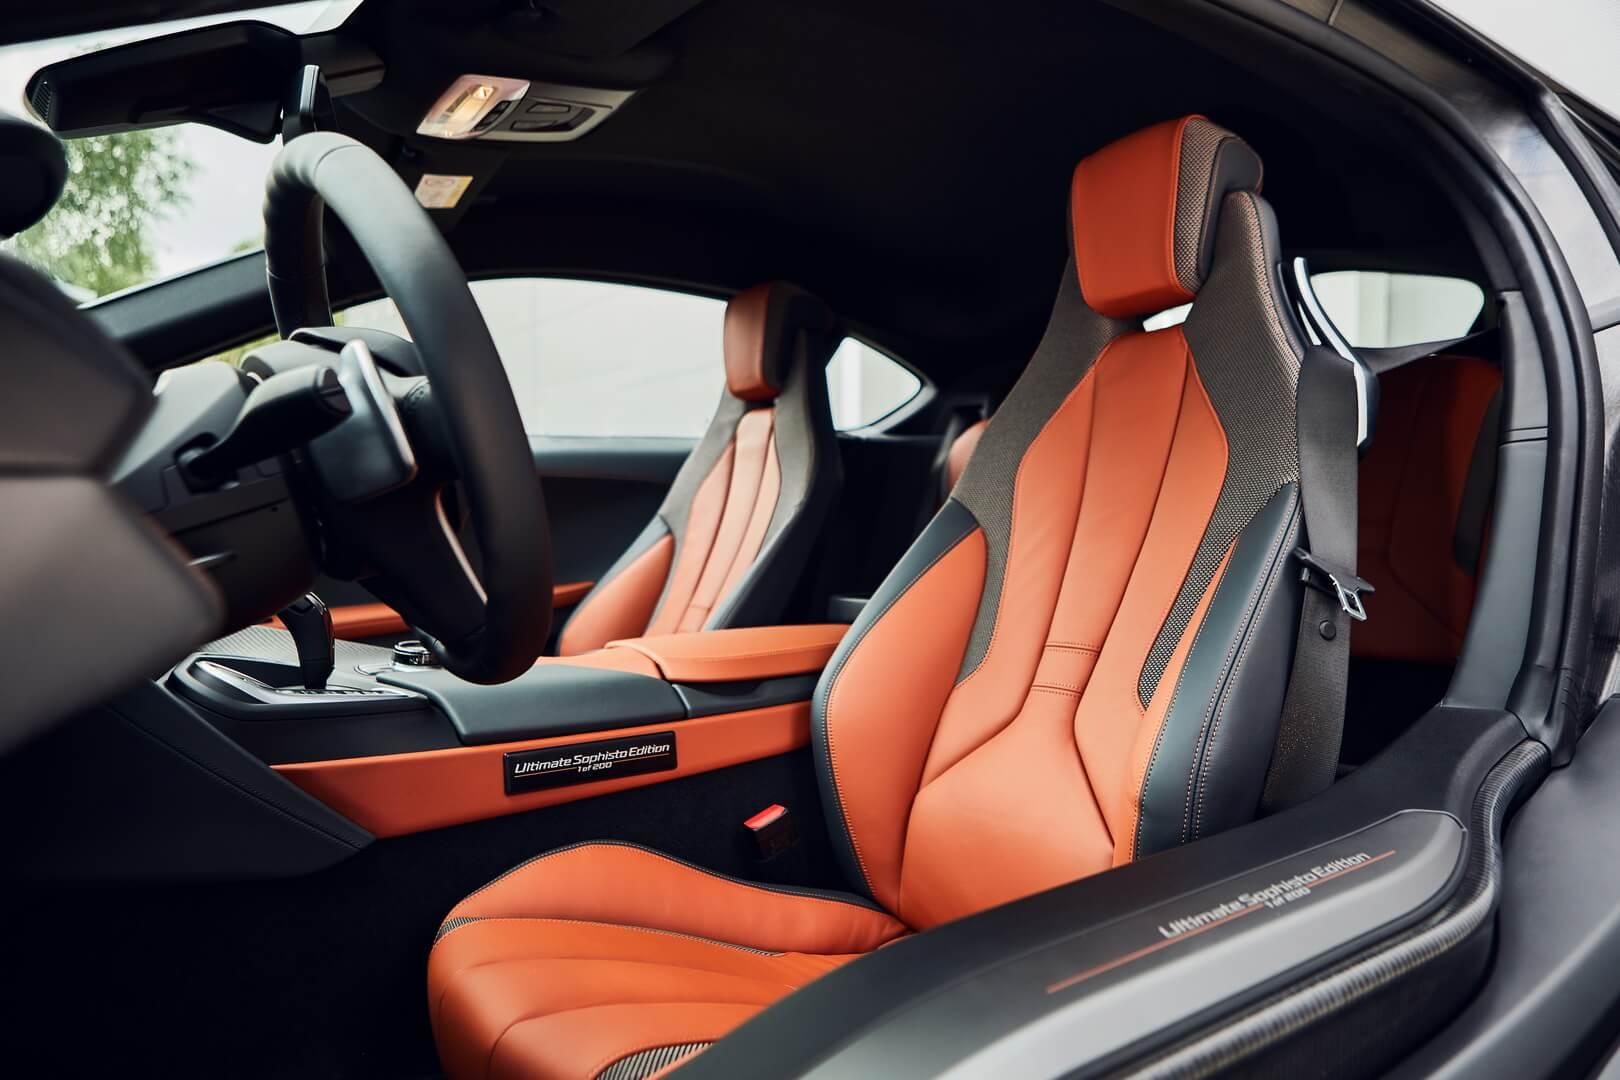 Интерьер BMW i8 Ultimate Sophisto Edition